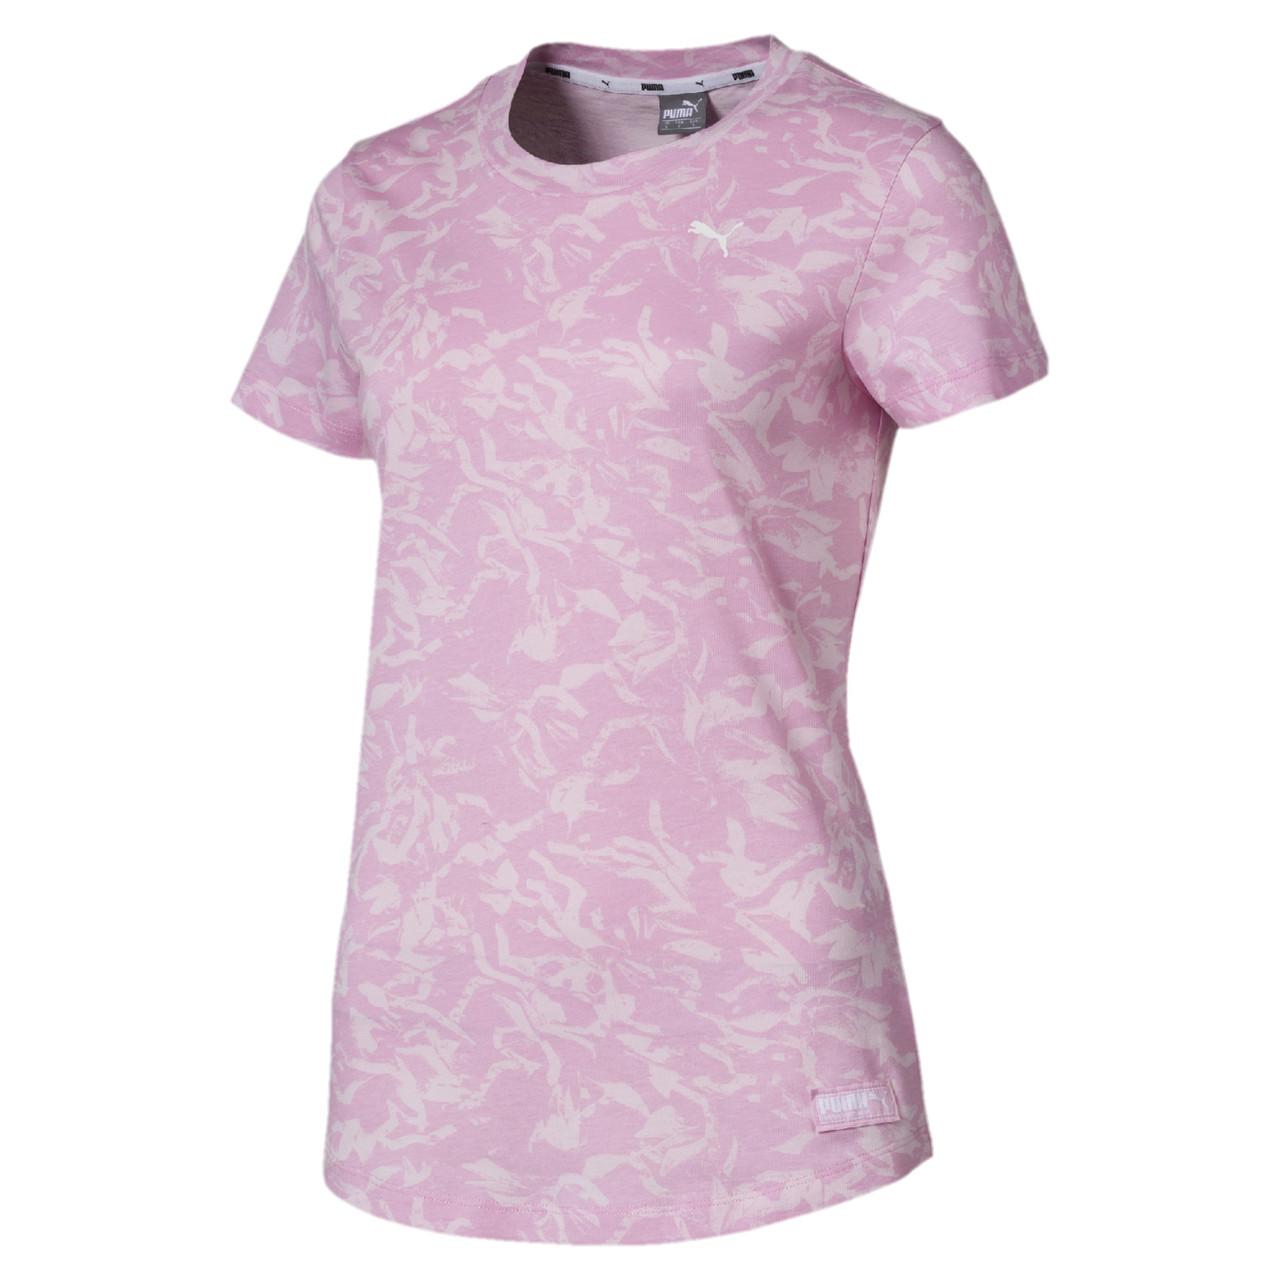 Женская спортивная футболка Fusion All-Over Printed Women'S Tee